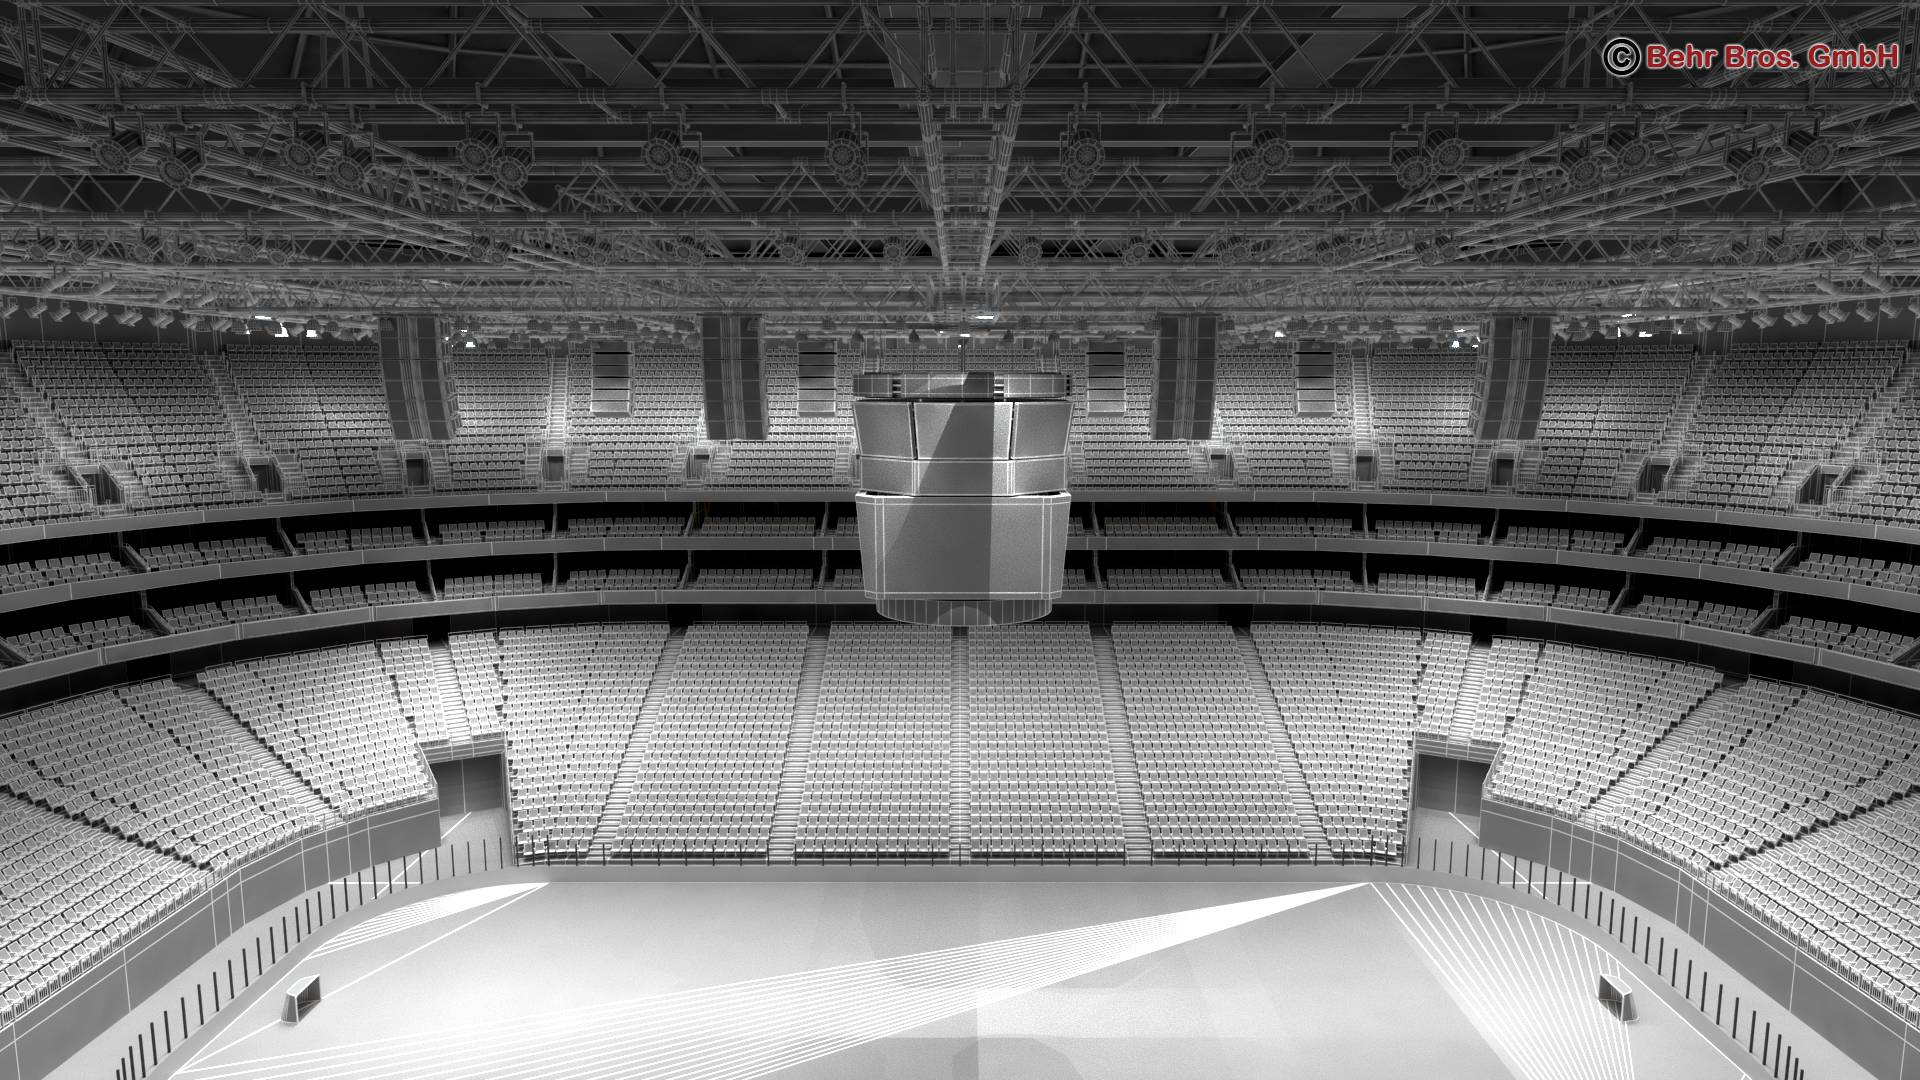 мөсөн хоккейн талбай V2 3d загвар 3ds max fbx c4d 251664